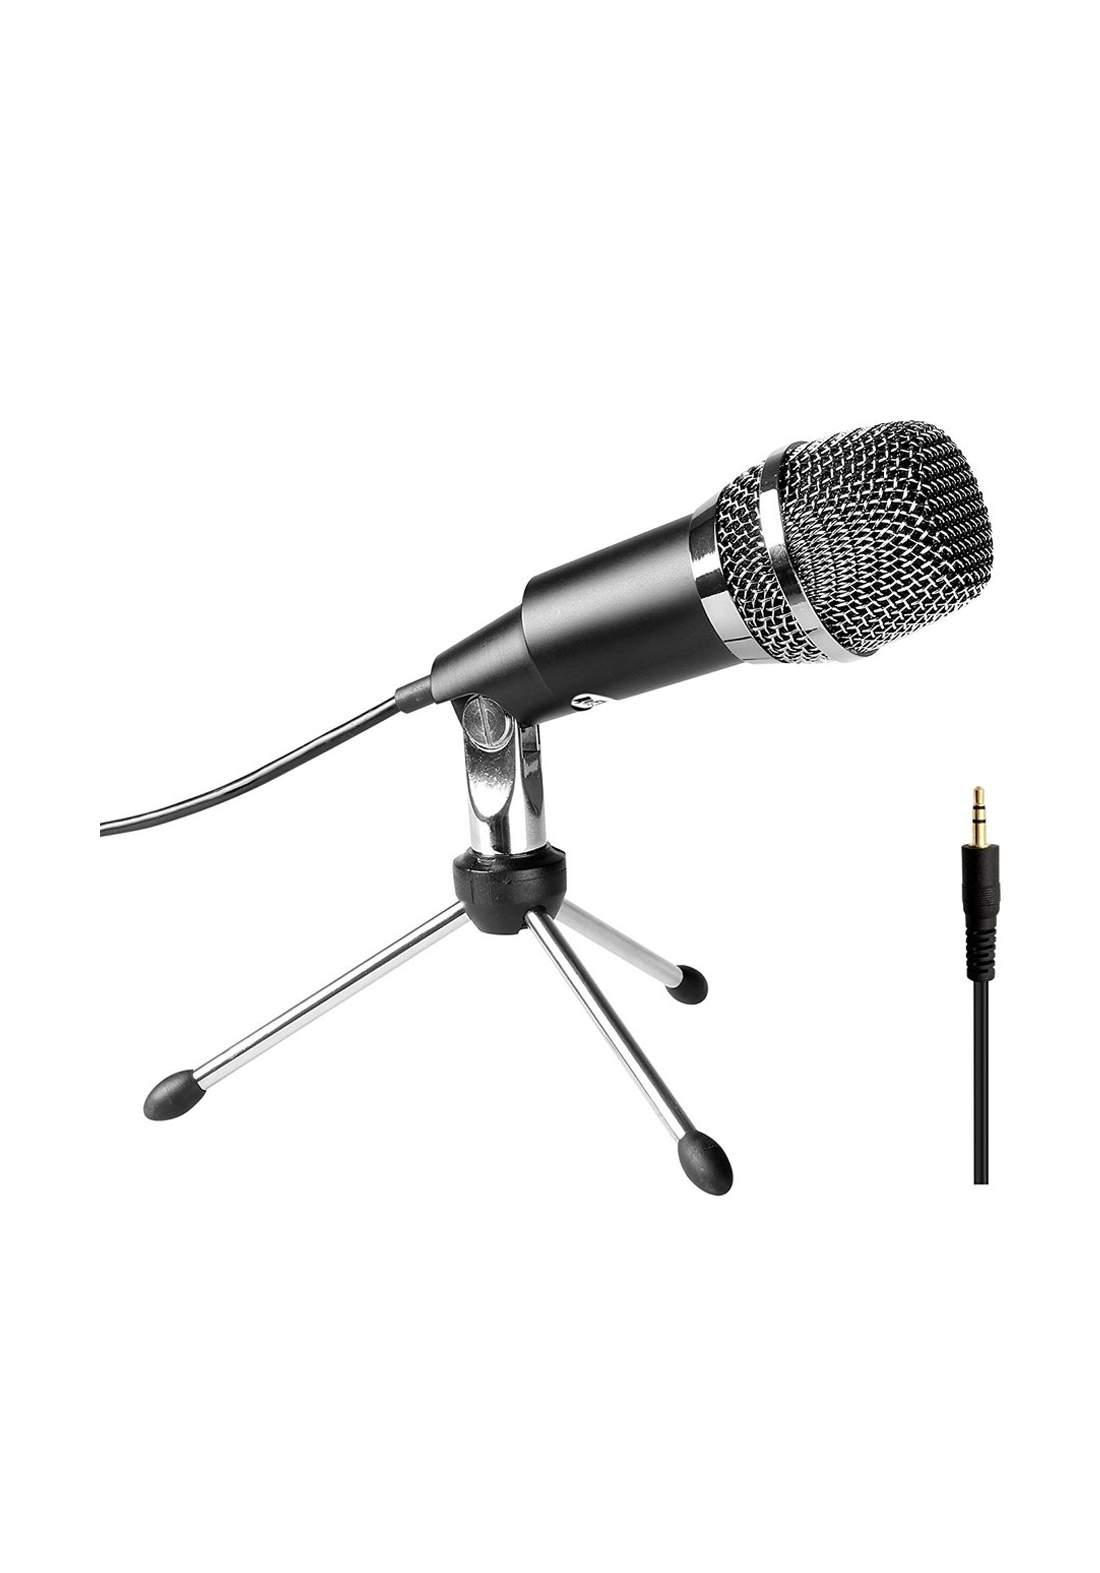 Fifine K667 Condenser Microphone for PC Computer - Black مايكروفون